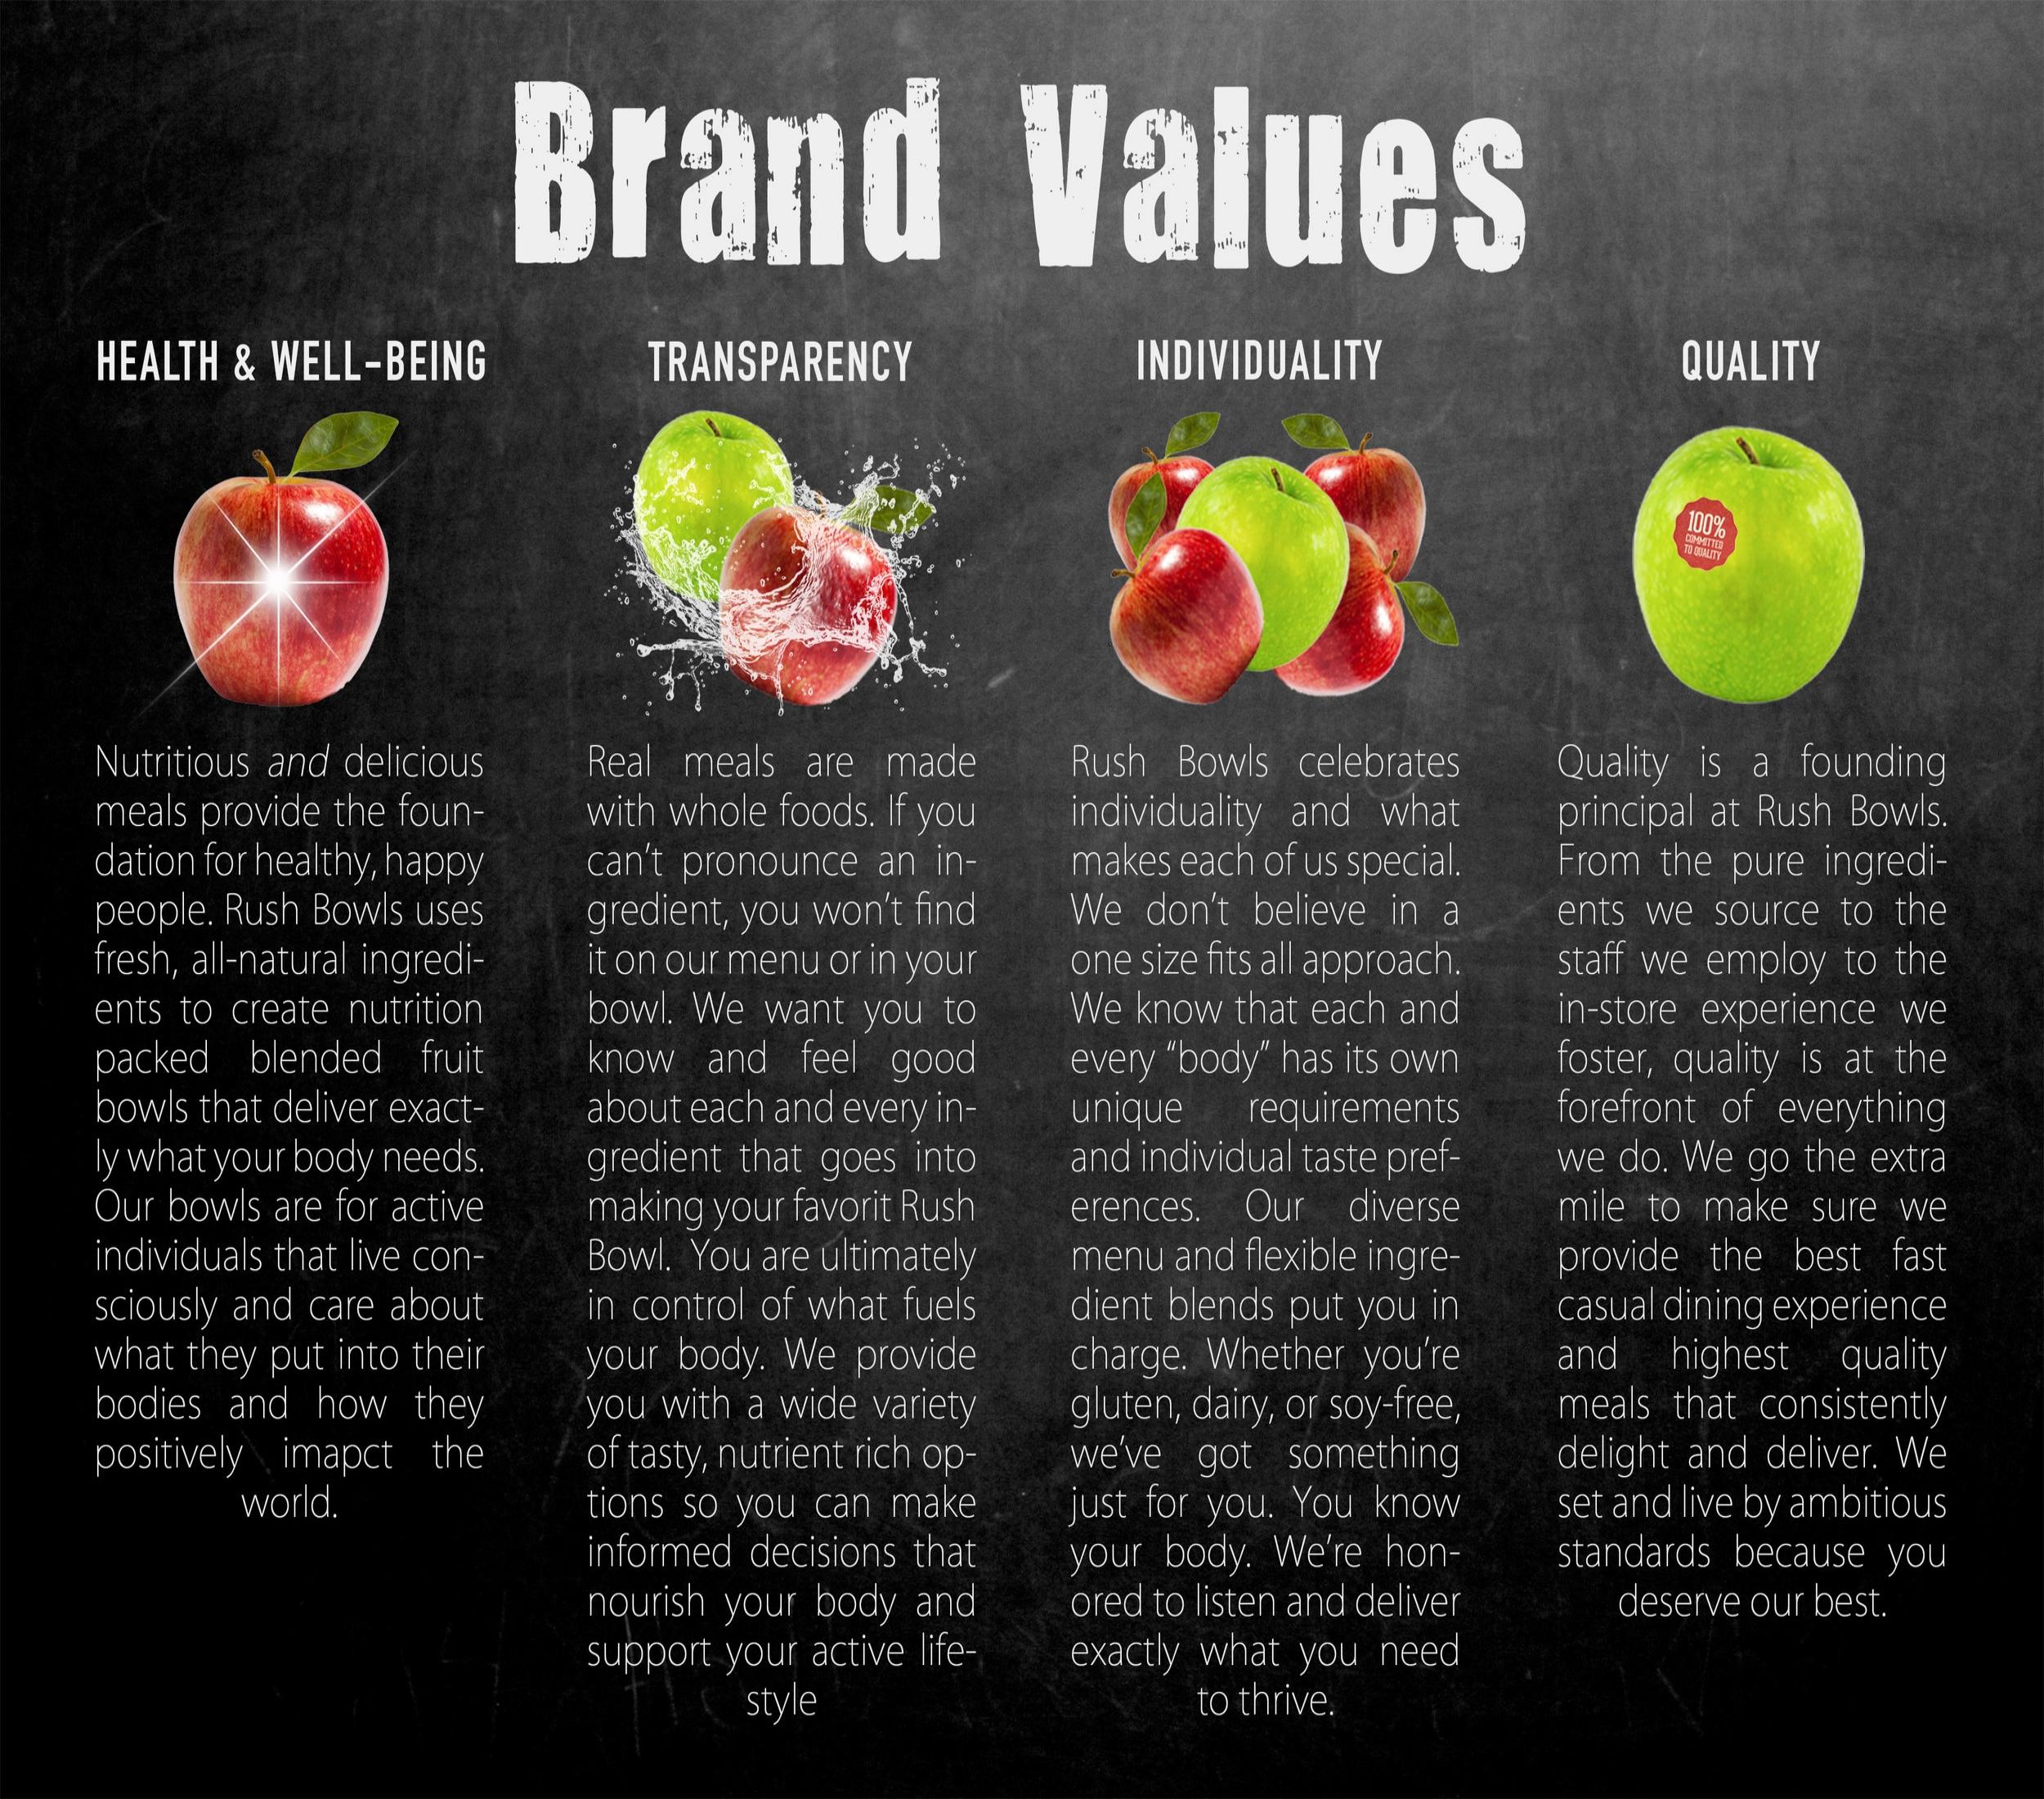 Brand Values 1.jpg